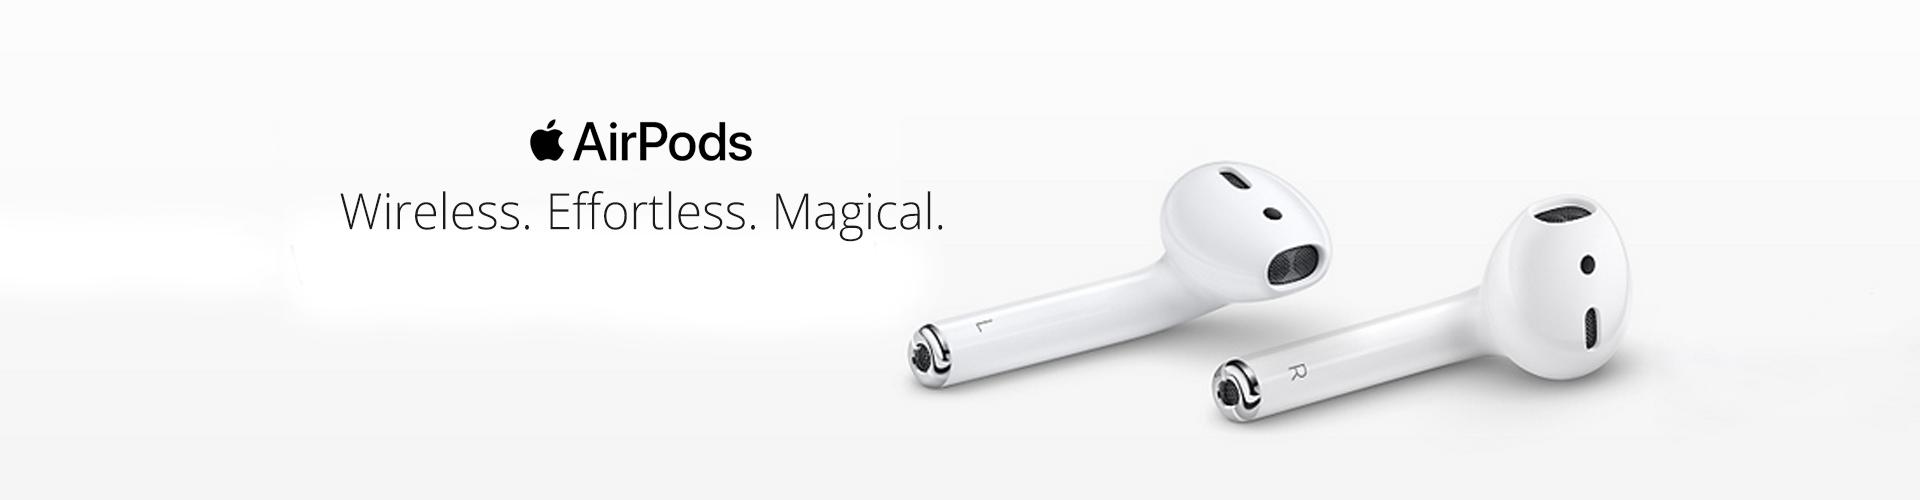 Apple AirPods - Phone Box